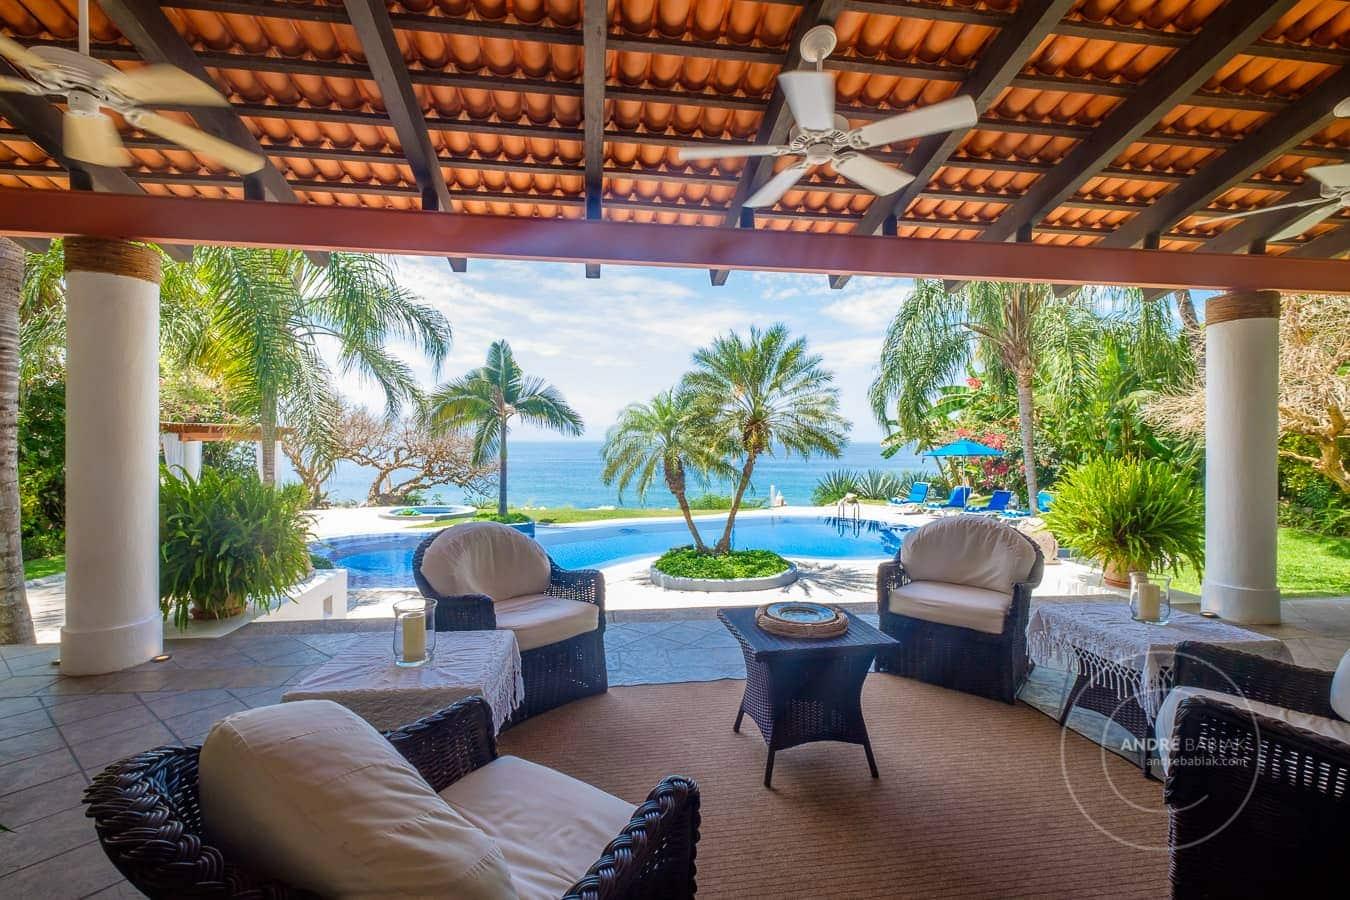 Architecture And Real Estate Photographer Puerto Vallarta 21